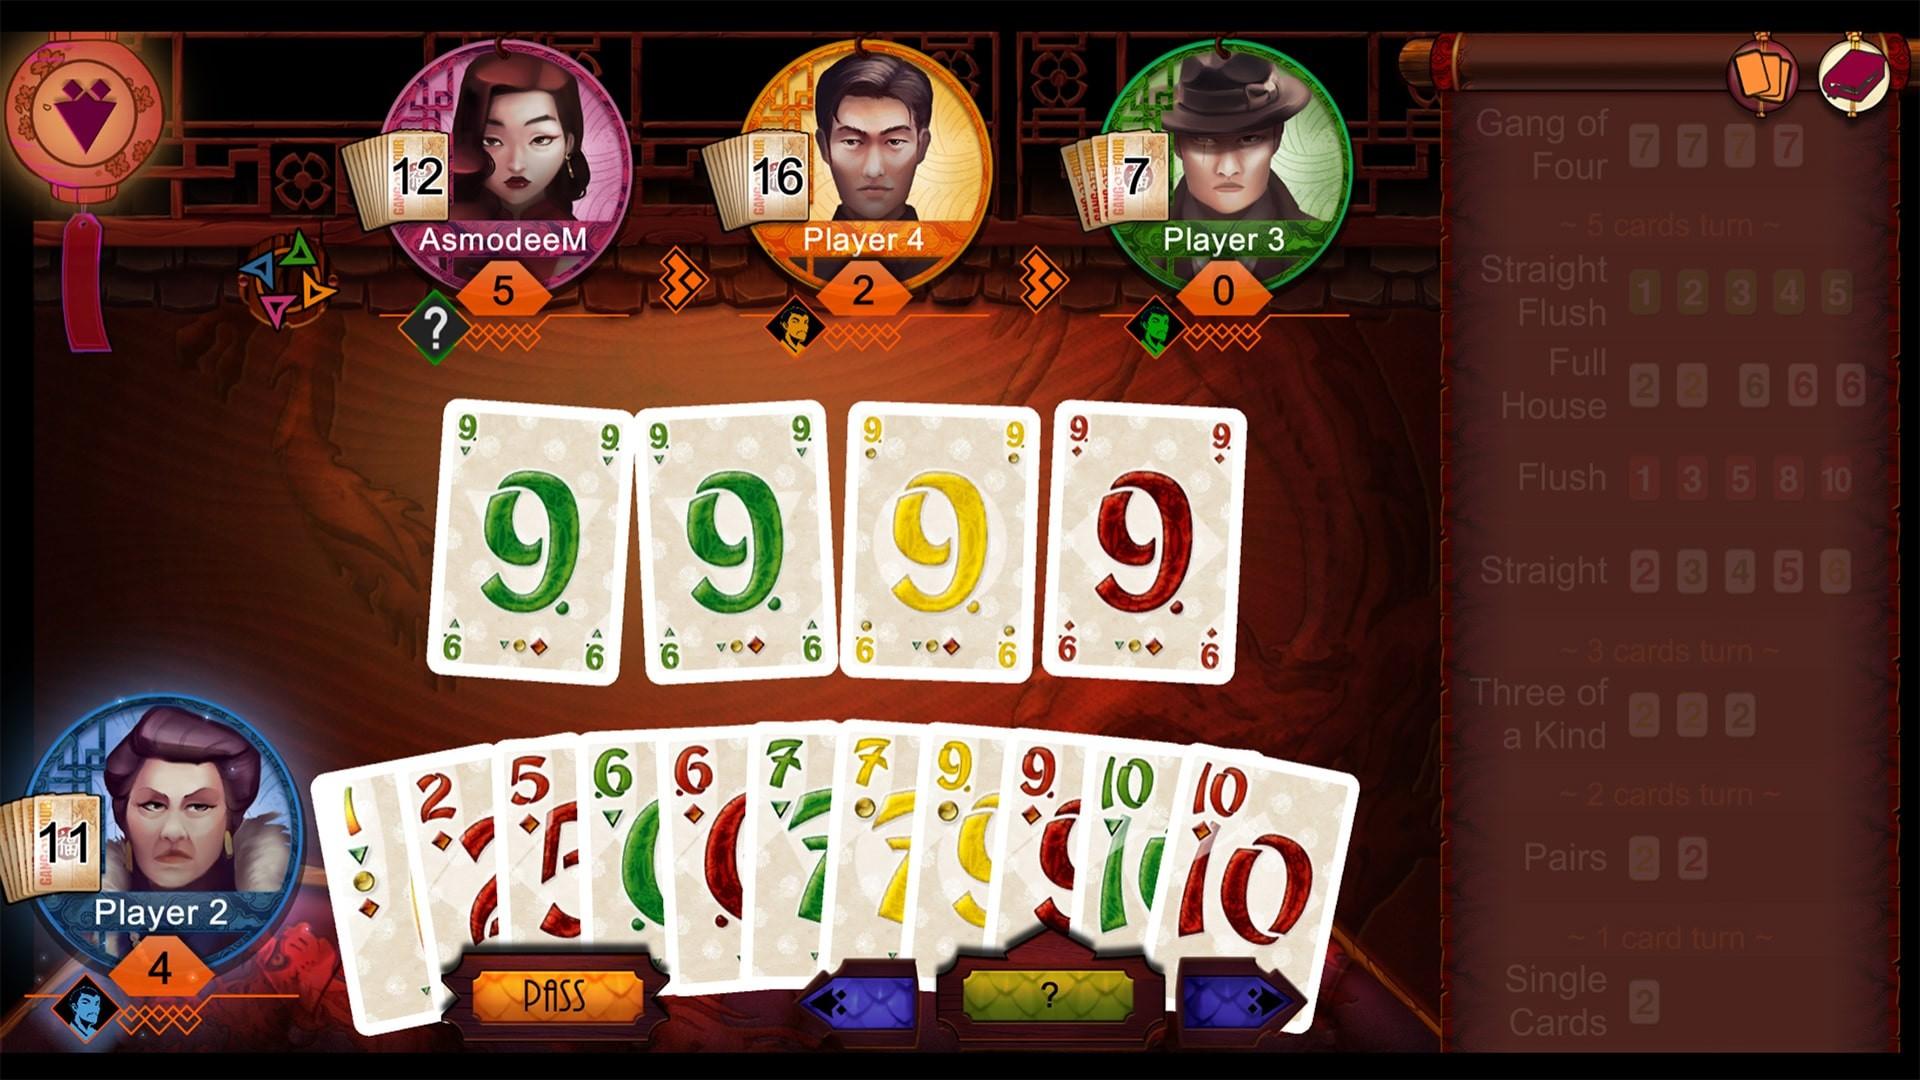 Steam喜加一 免费领取棋牌游戏《Gang of Four》